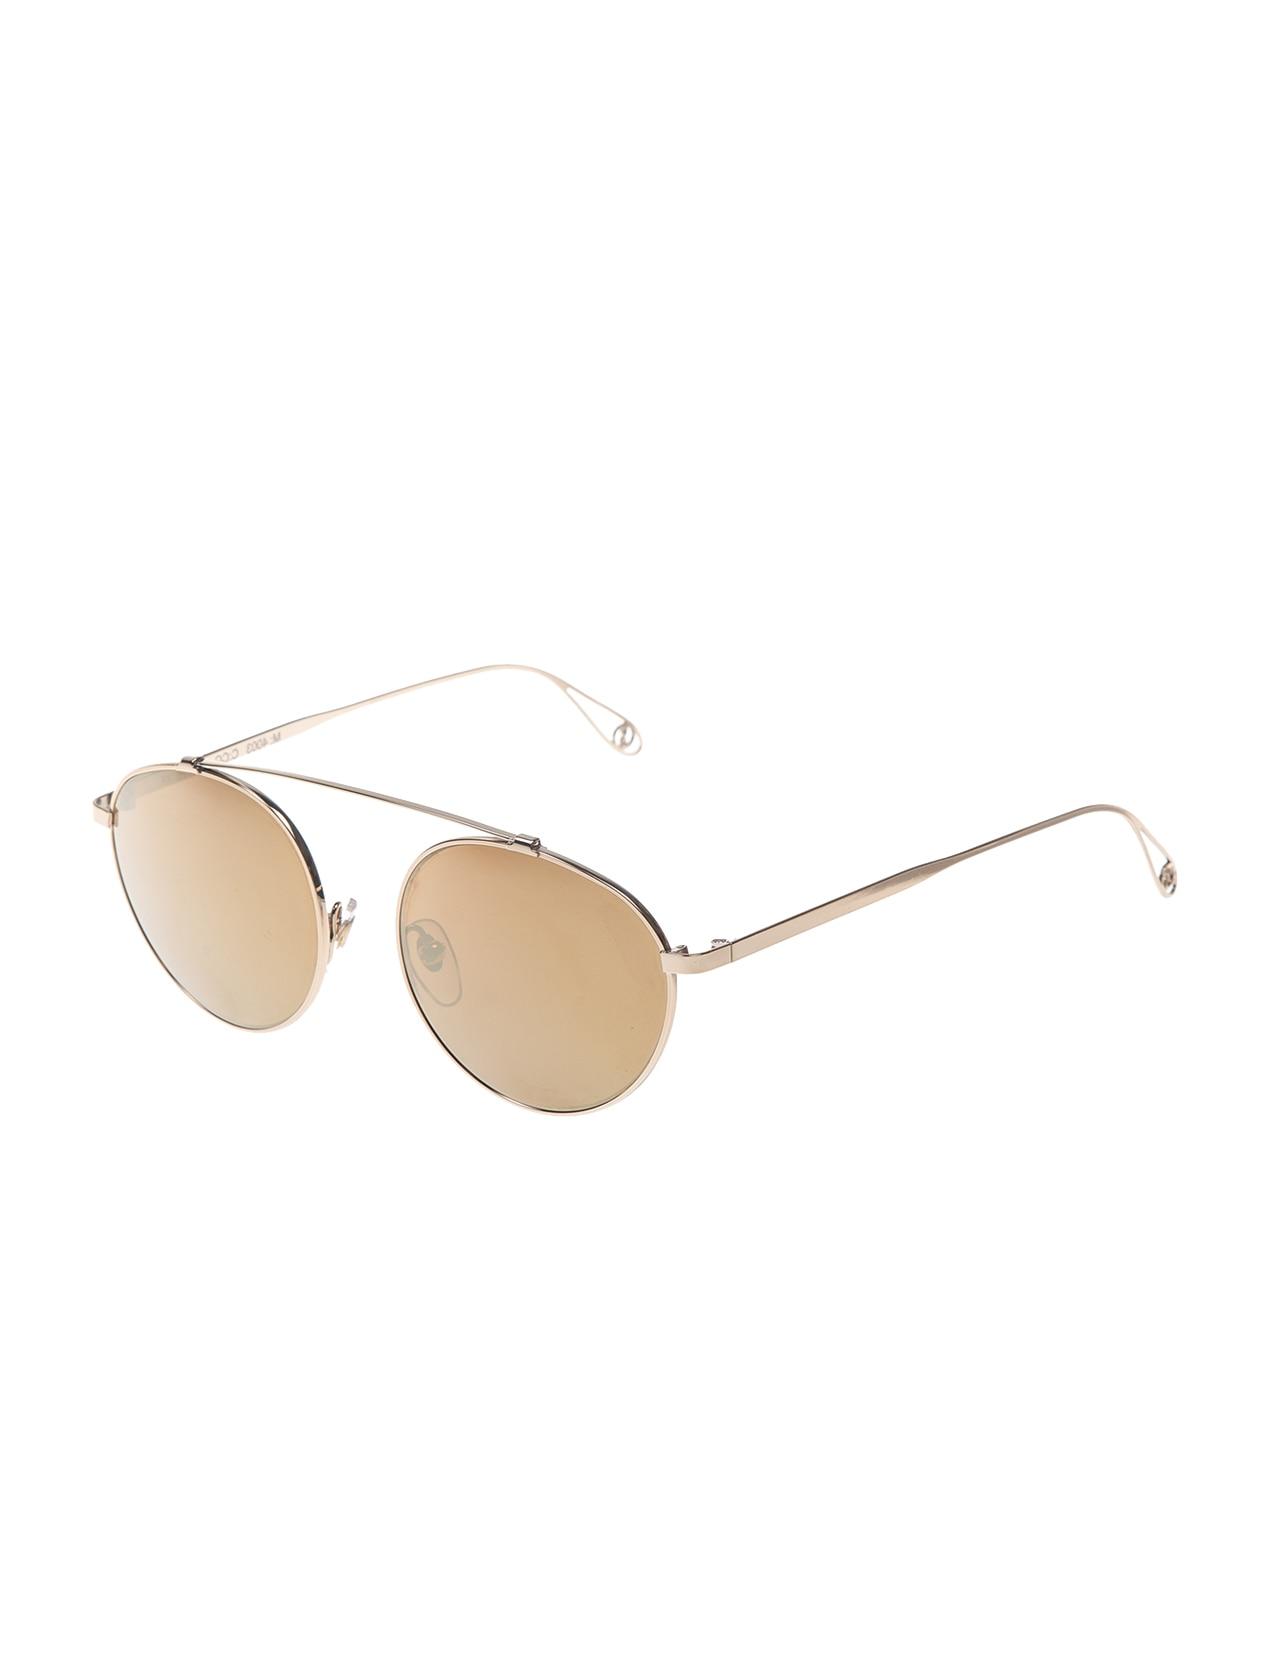 Unisex sunglasses msd 4003 cg metal yellow organic oval aval 52-16-140 massada